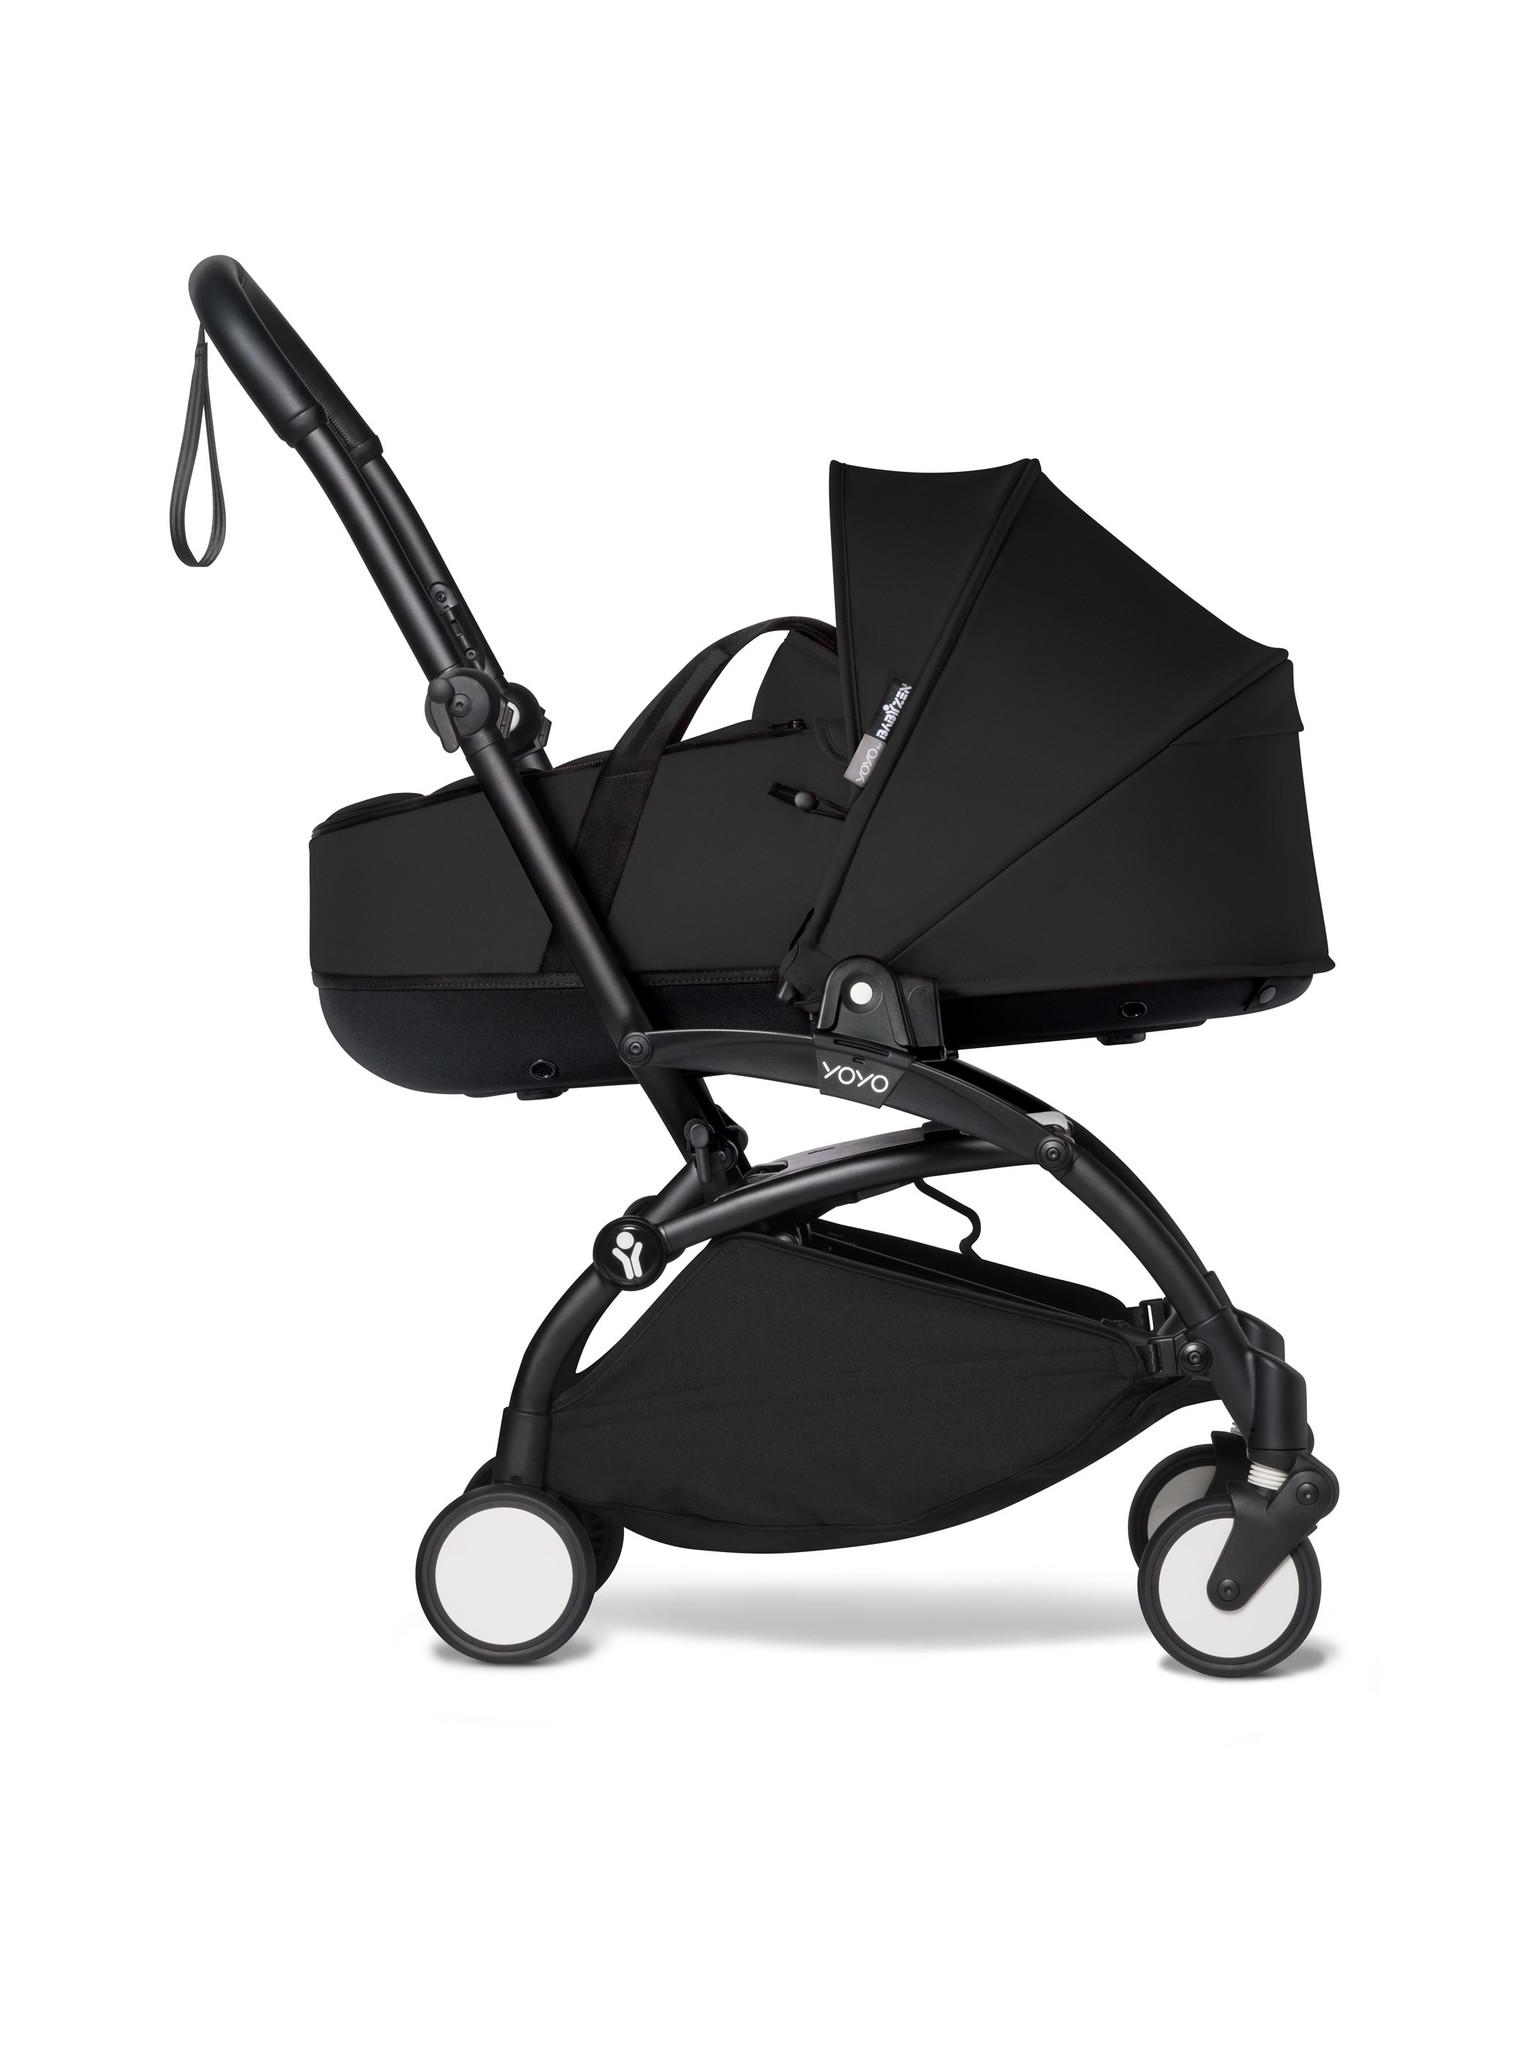 Babyzen Babyzen YOYO² schwarzer Rahmen mit YOYO Stubenwagen - Tragetasche - Schwarz